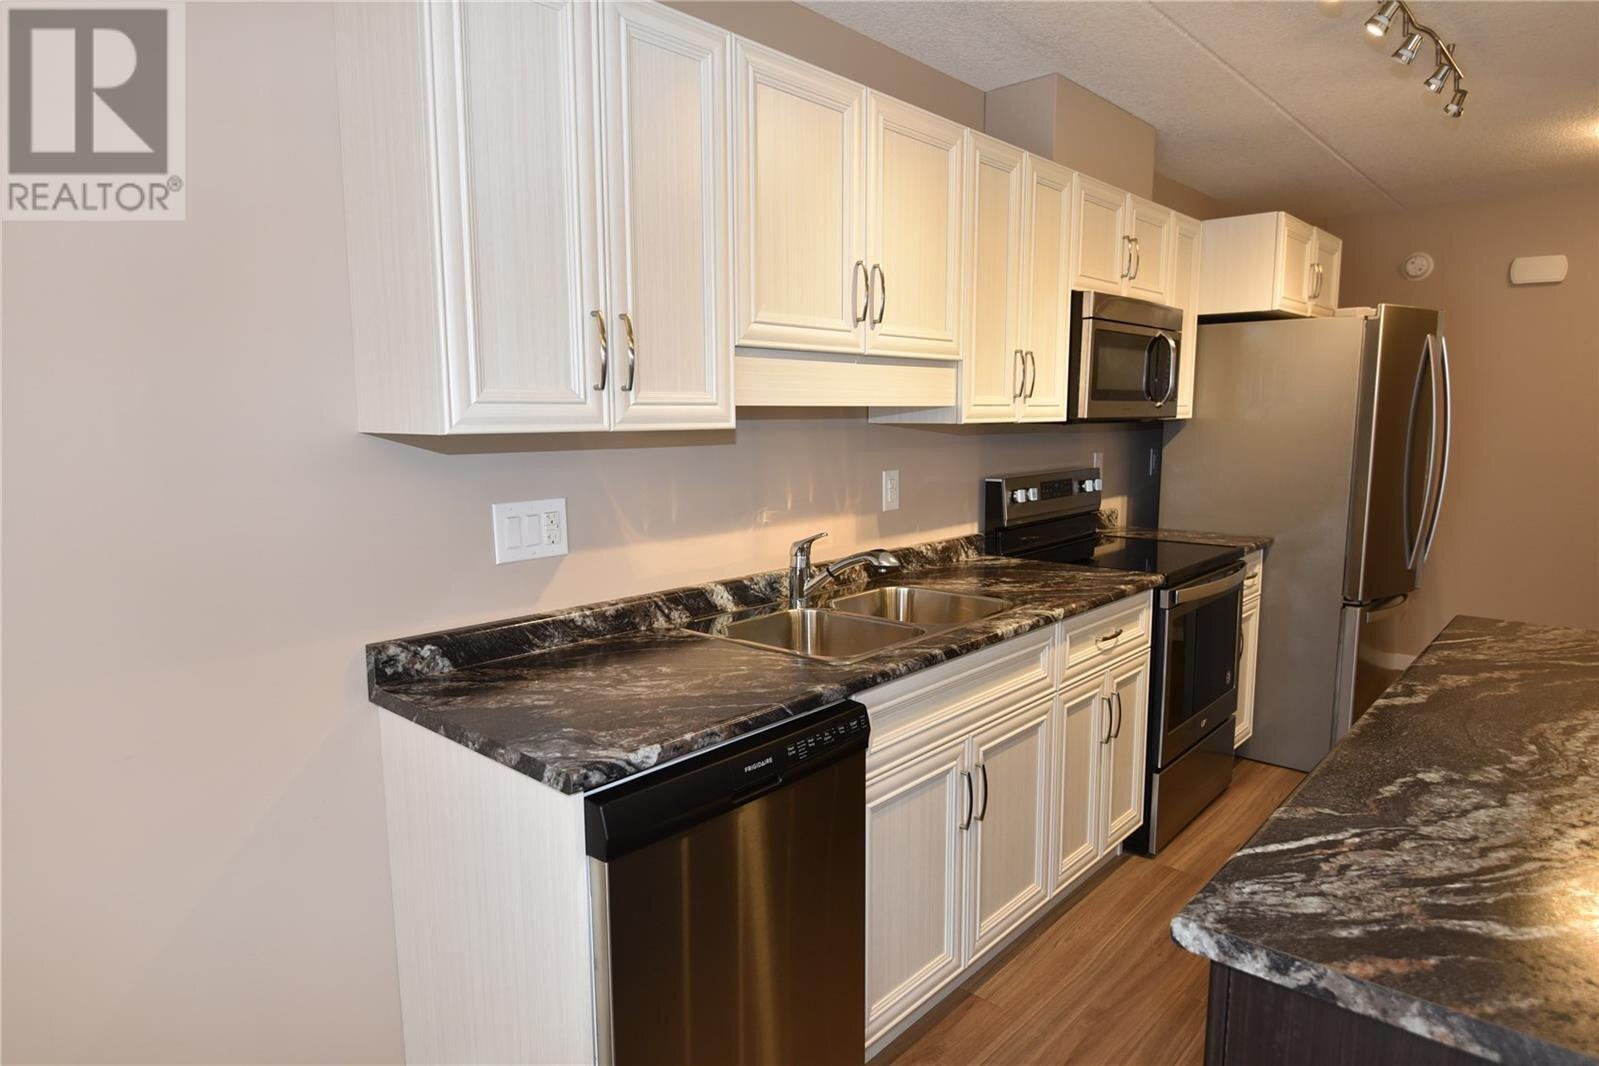 Condo for sale at 516 4th St E Unit 203 Nipawin Saskatchewan - MLS: SK826783